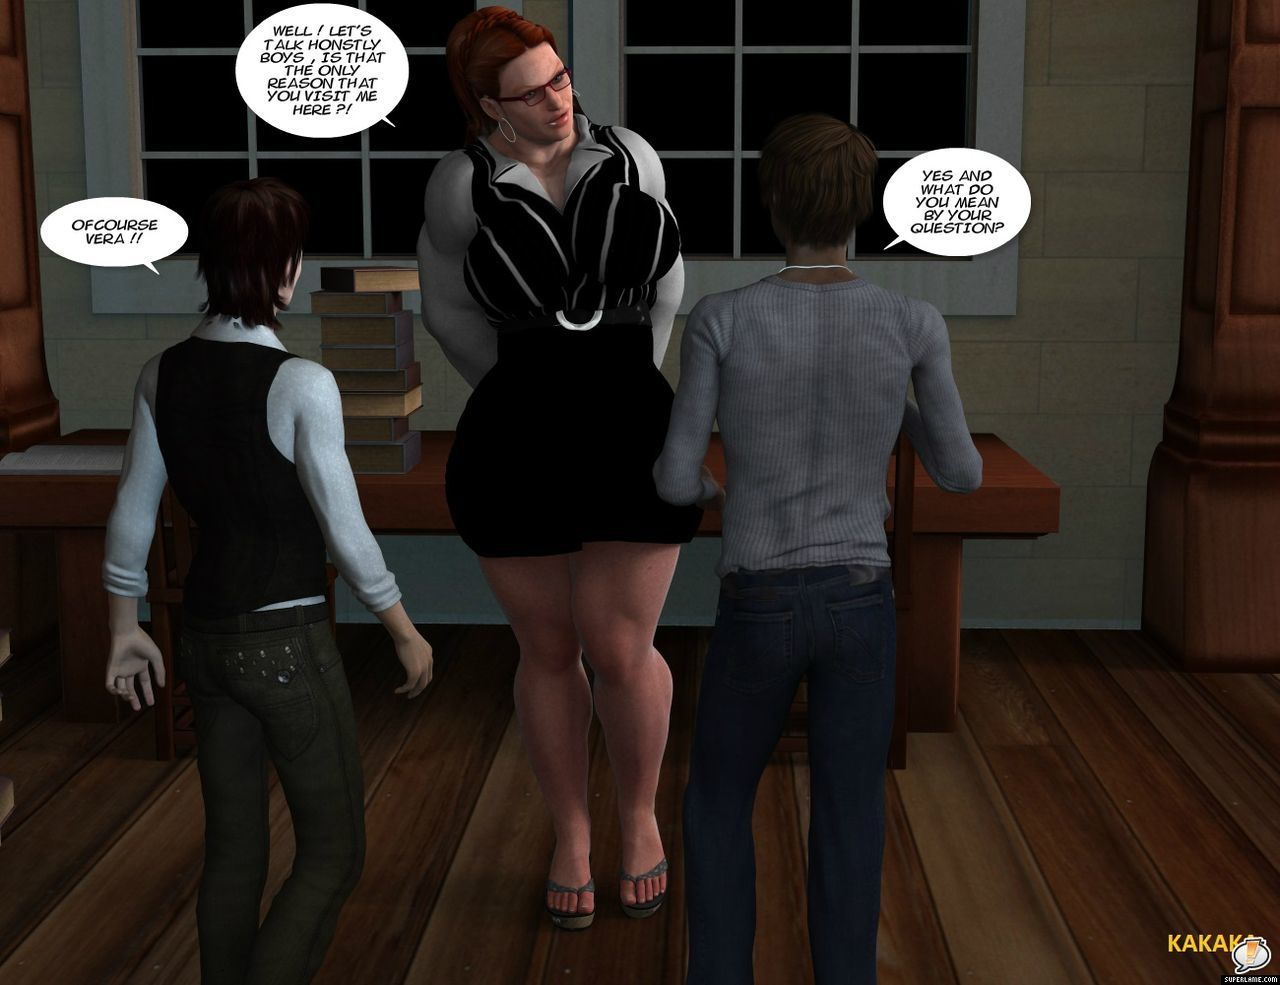 [kakaka] The story of Vera Vincent. - part 2